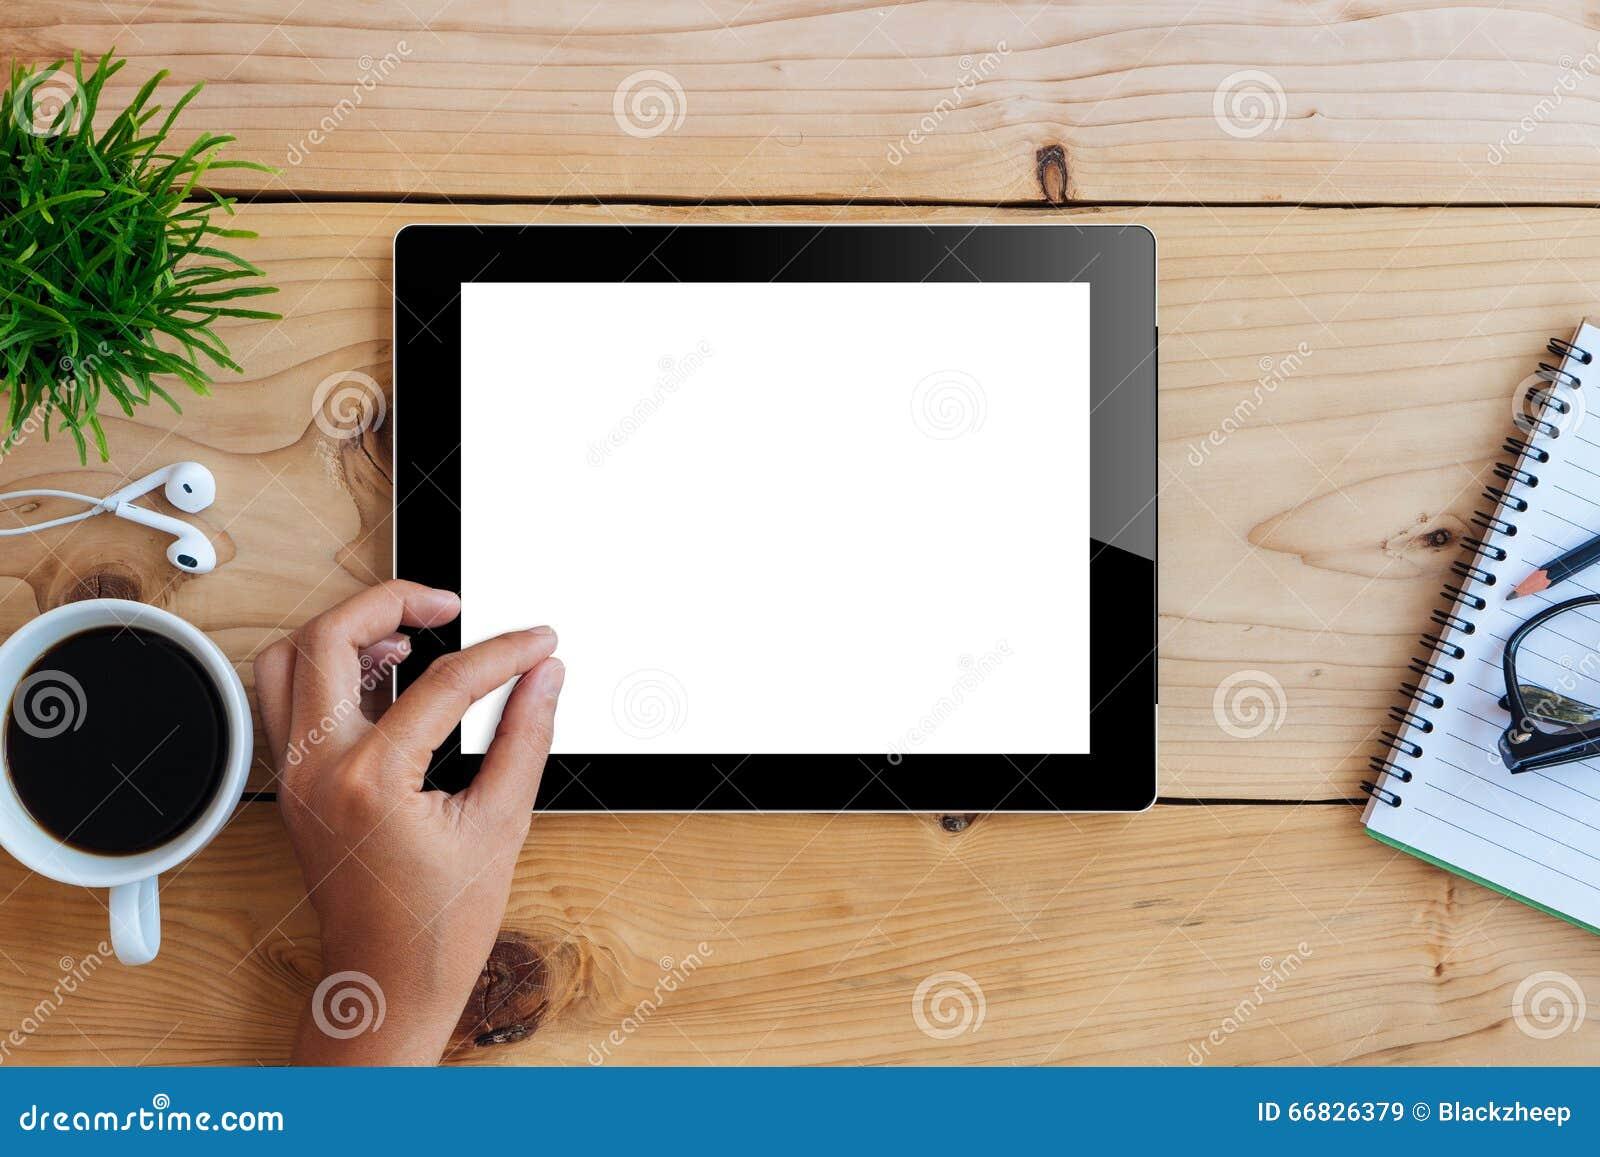 Hand using mockup tablet on wood desk white display